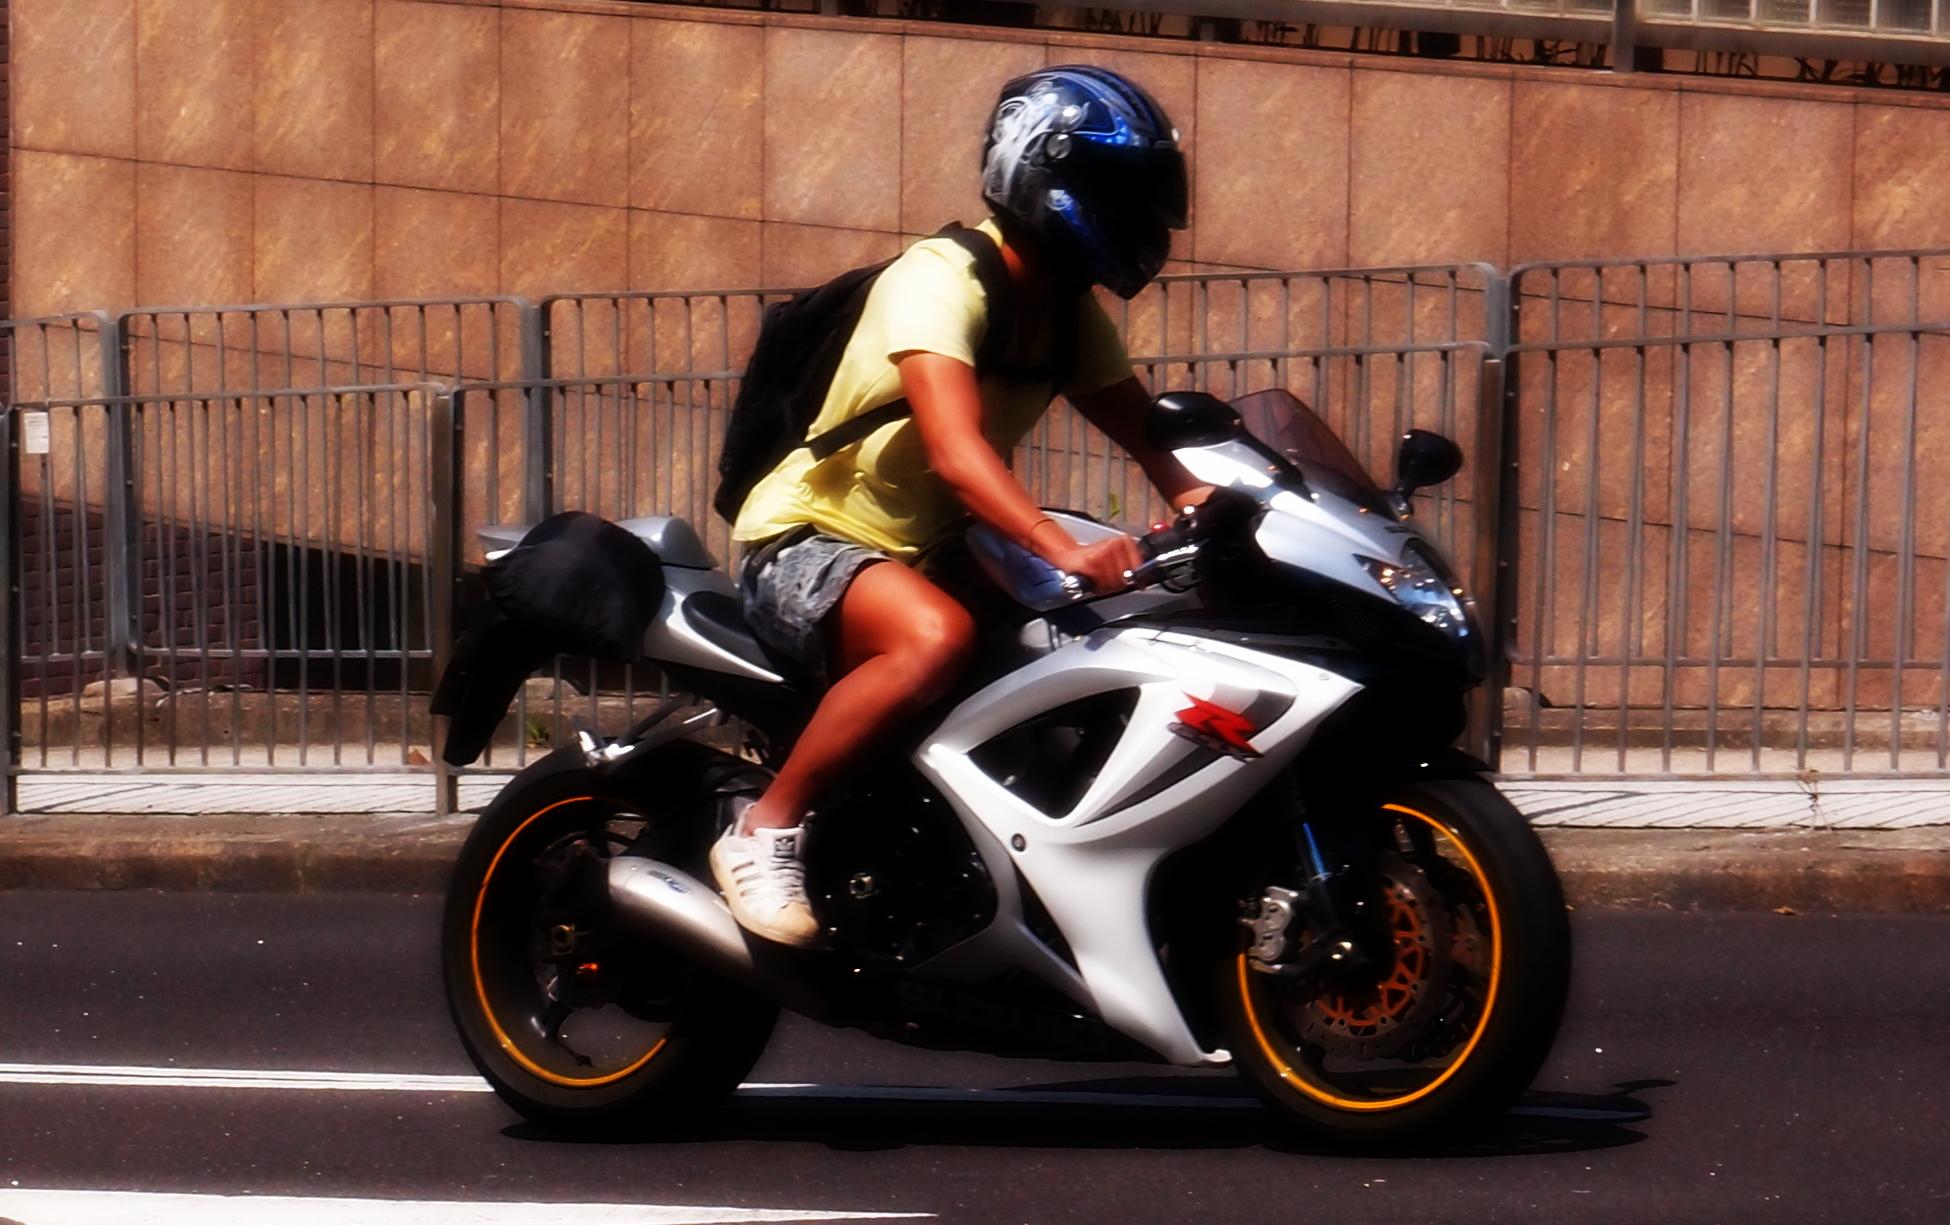 Nice bike... I am not as anorakish about bikes as I am cars.